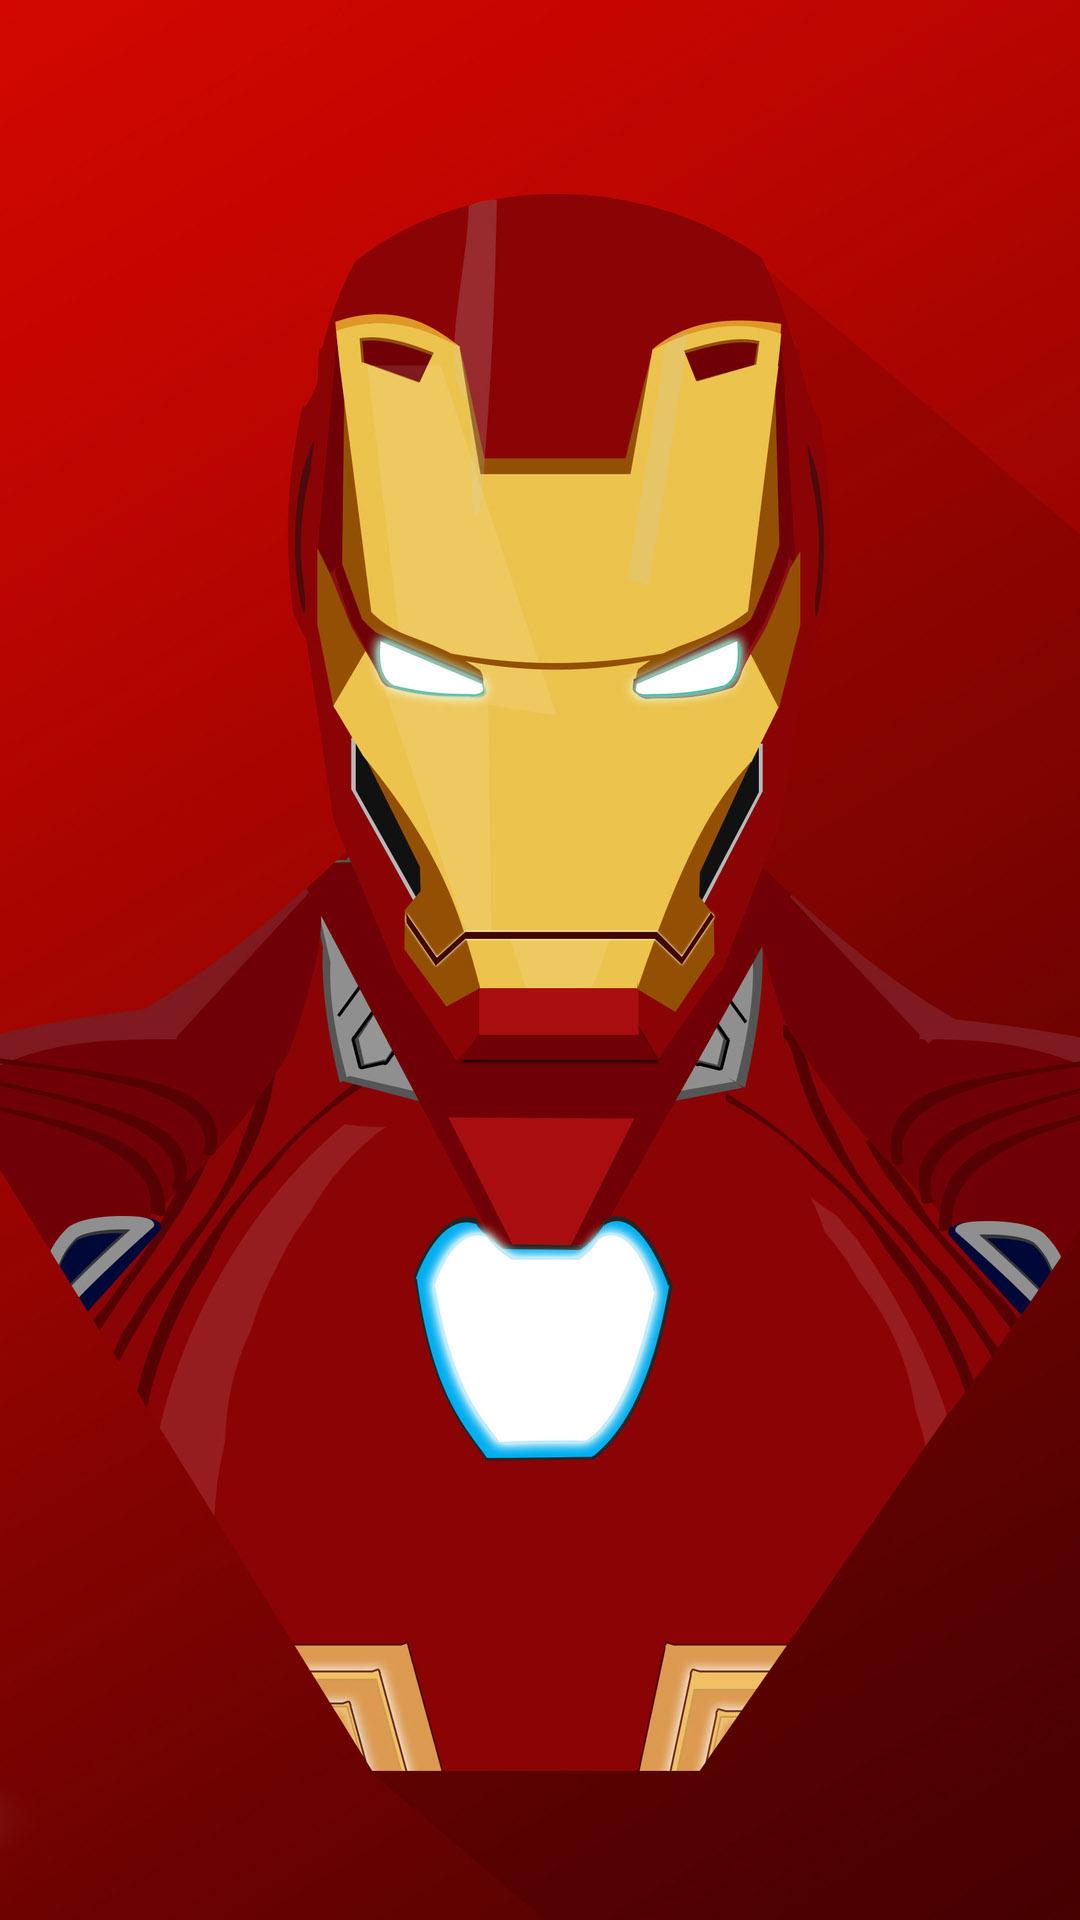 Iron Man Bleeding Edge Armor iPhone Wallpaper